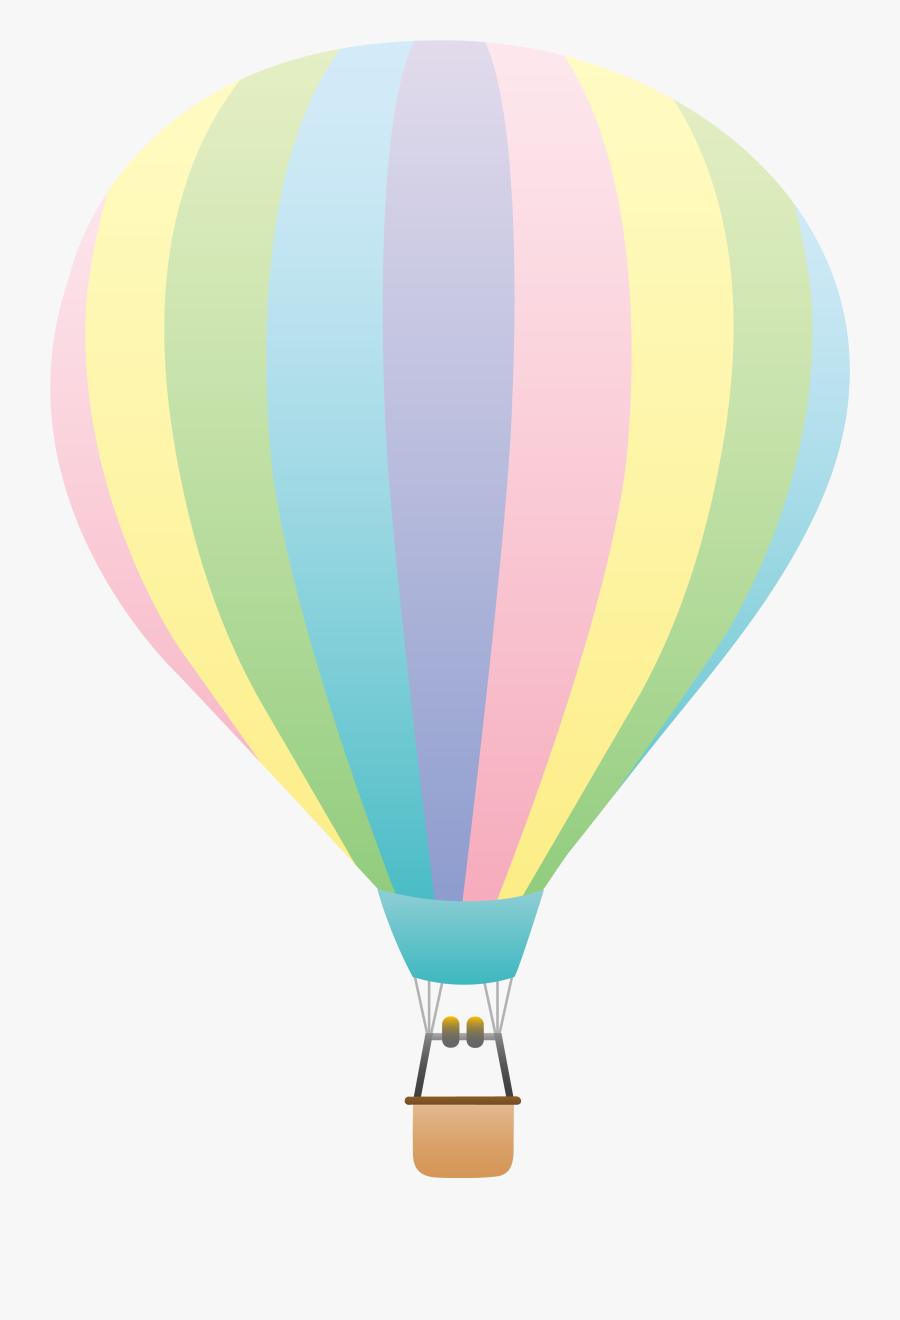 Hot air balloon clipart. Free download transparent .PNG | Creazilla